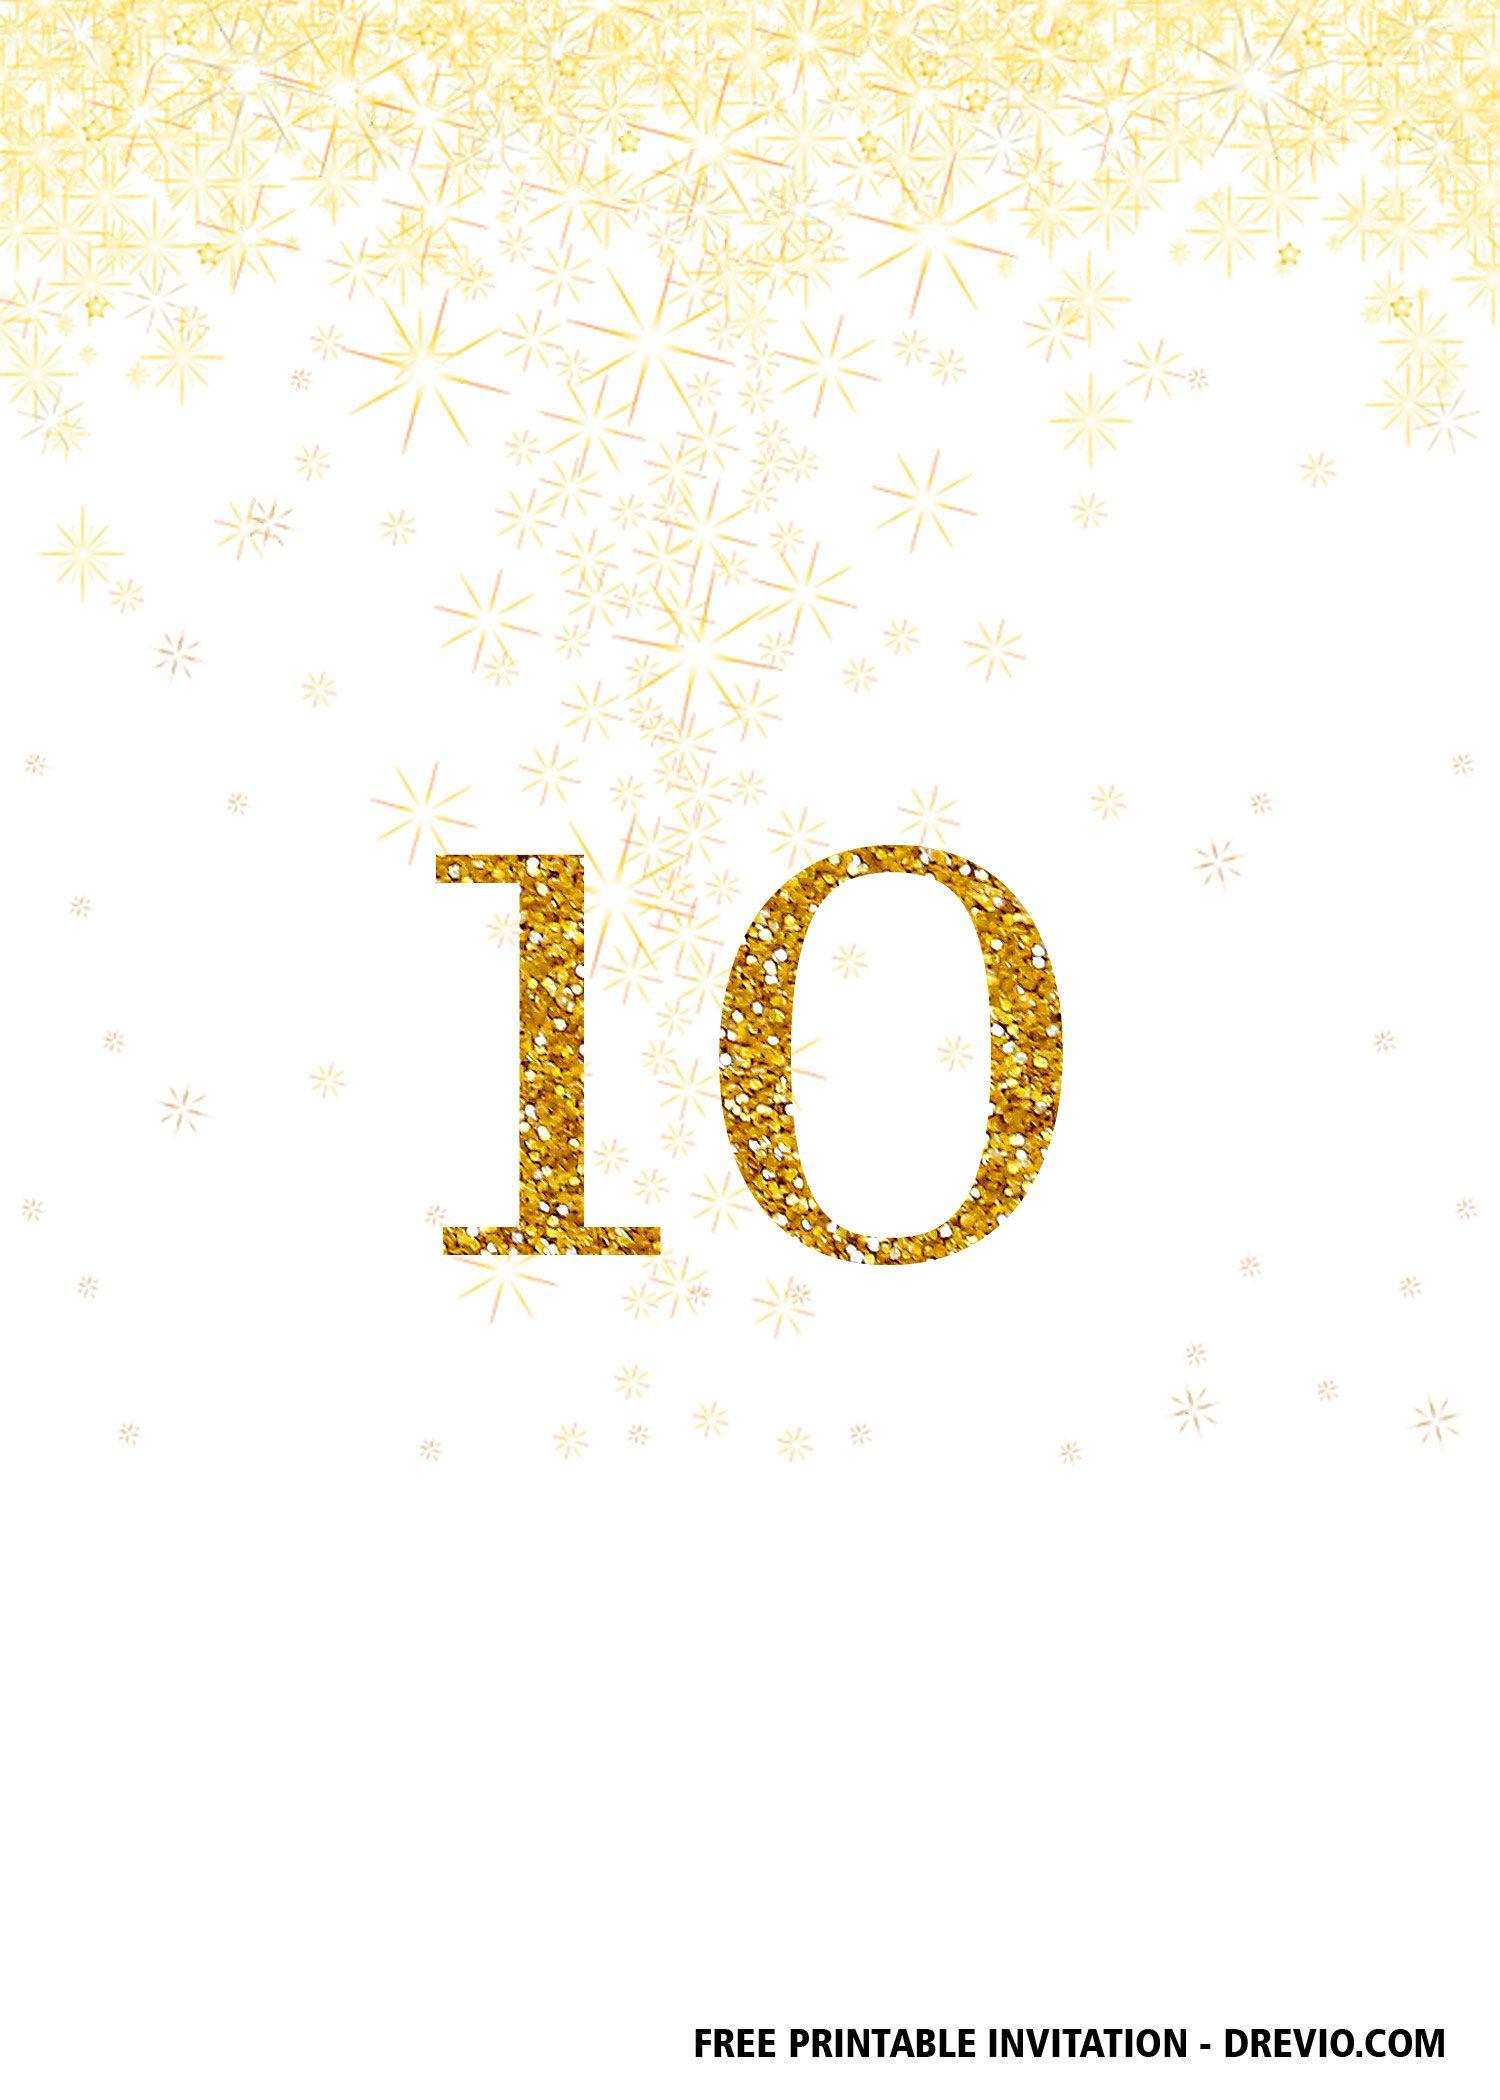 Free Printable 10th Birthday Invitation Templates Free Printable Birthday Invitations Free Birthday Invitation Templates Free Birthday Invitations